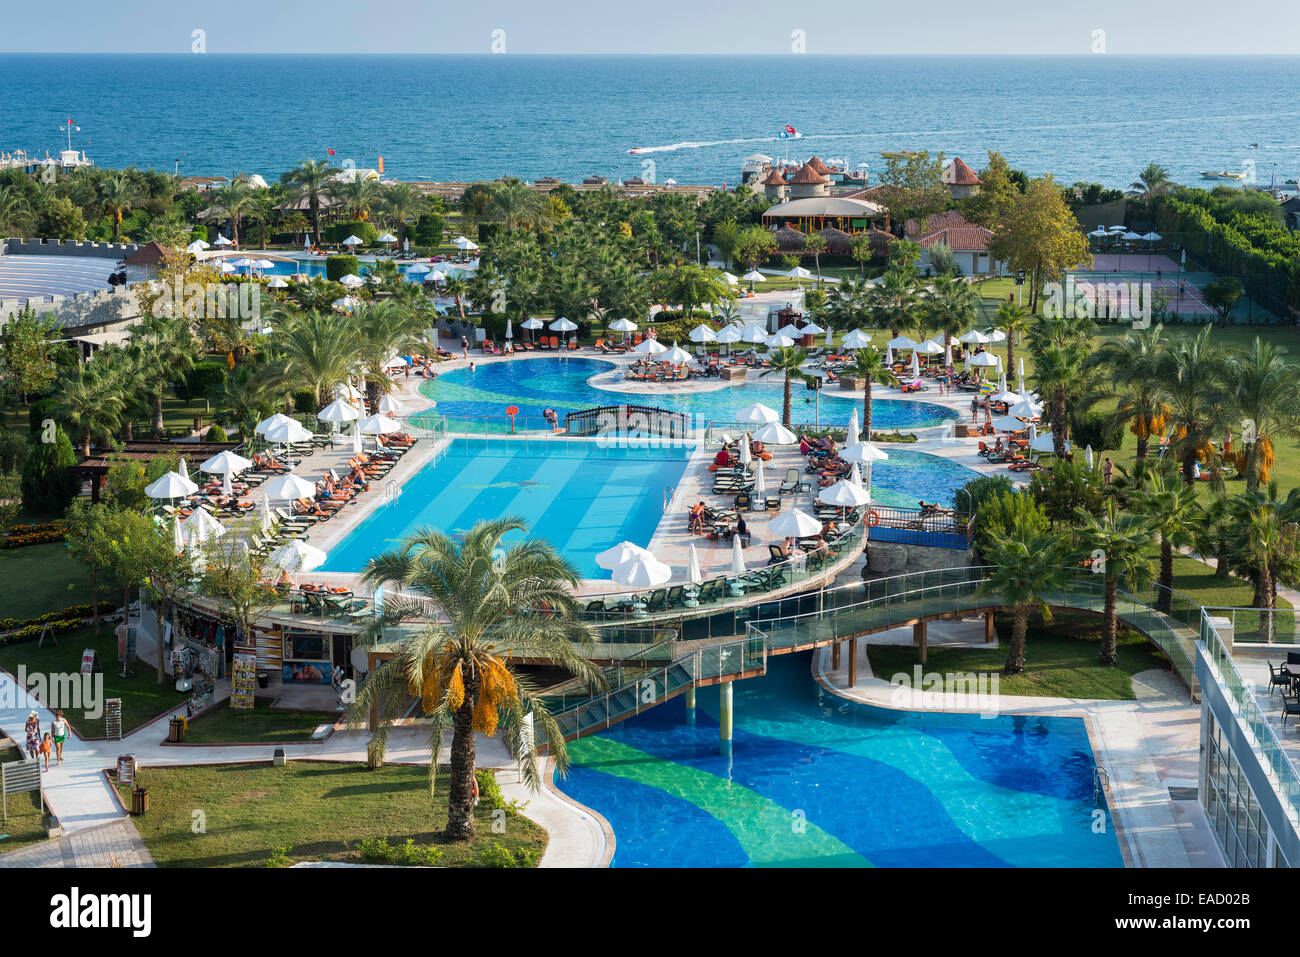 Sheerwood Breezes Resort Five Star Hotel Recreational Facilities